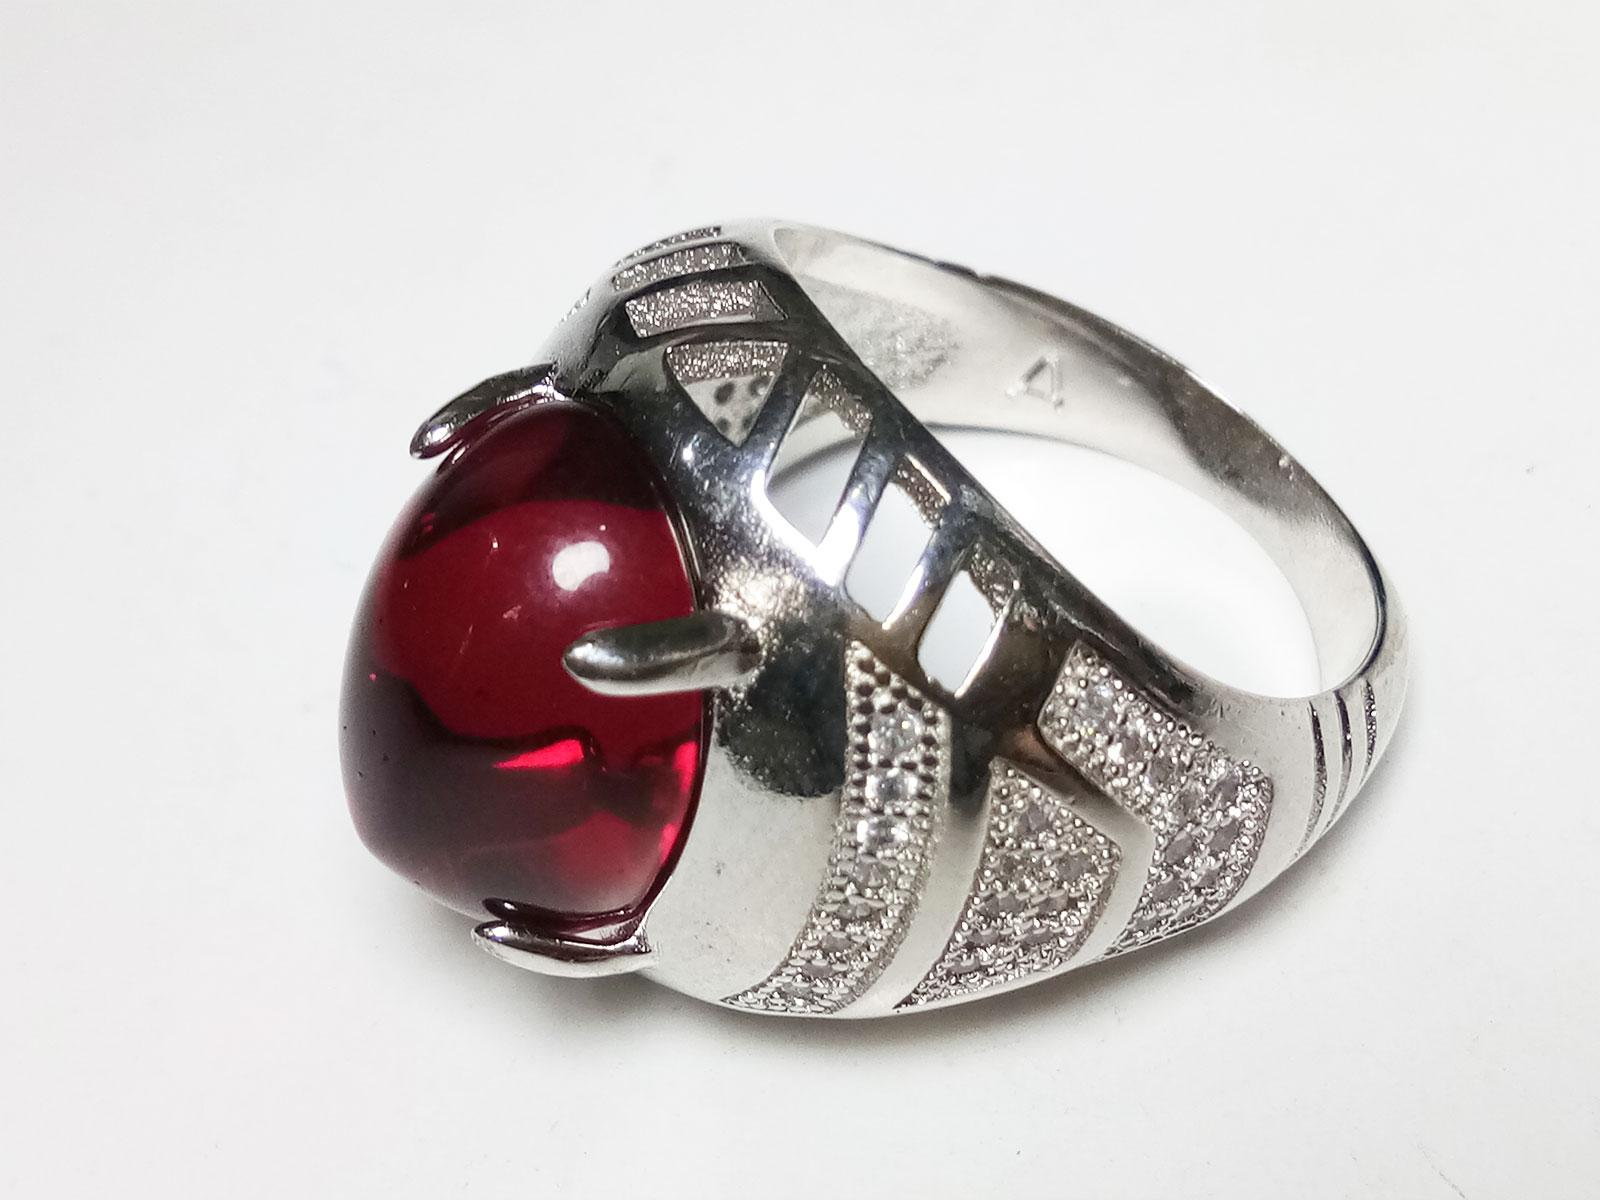 Beau Ring Cincin Emban Platinum Ta3 Daftar Harga Termurah Terkini Grosir Ikat Alpaka Bakar Polos Size Standart Lokal Vee Super Import Batu Merah Delima Siam M3